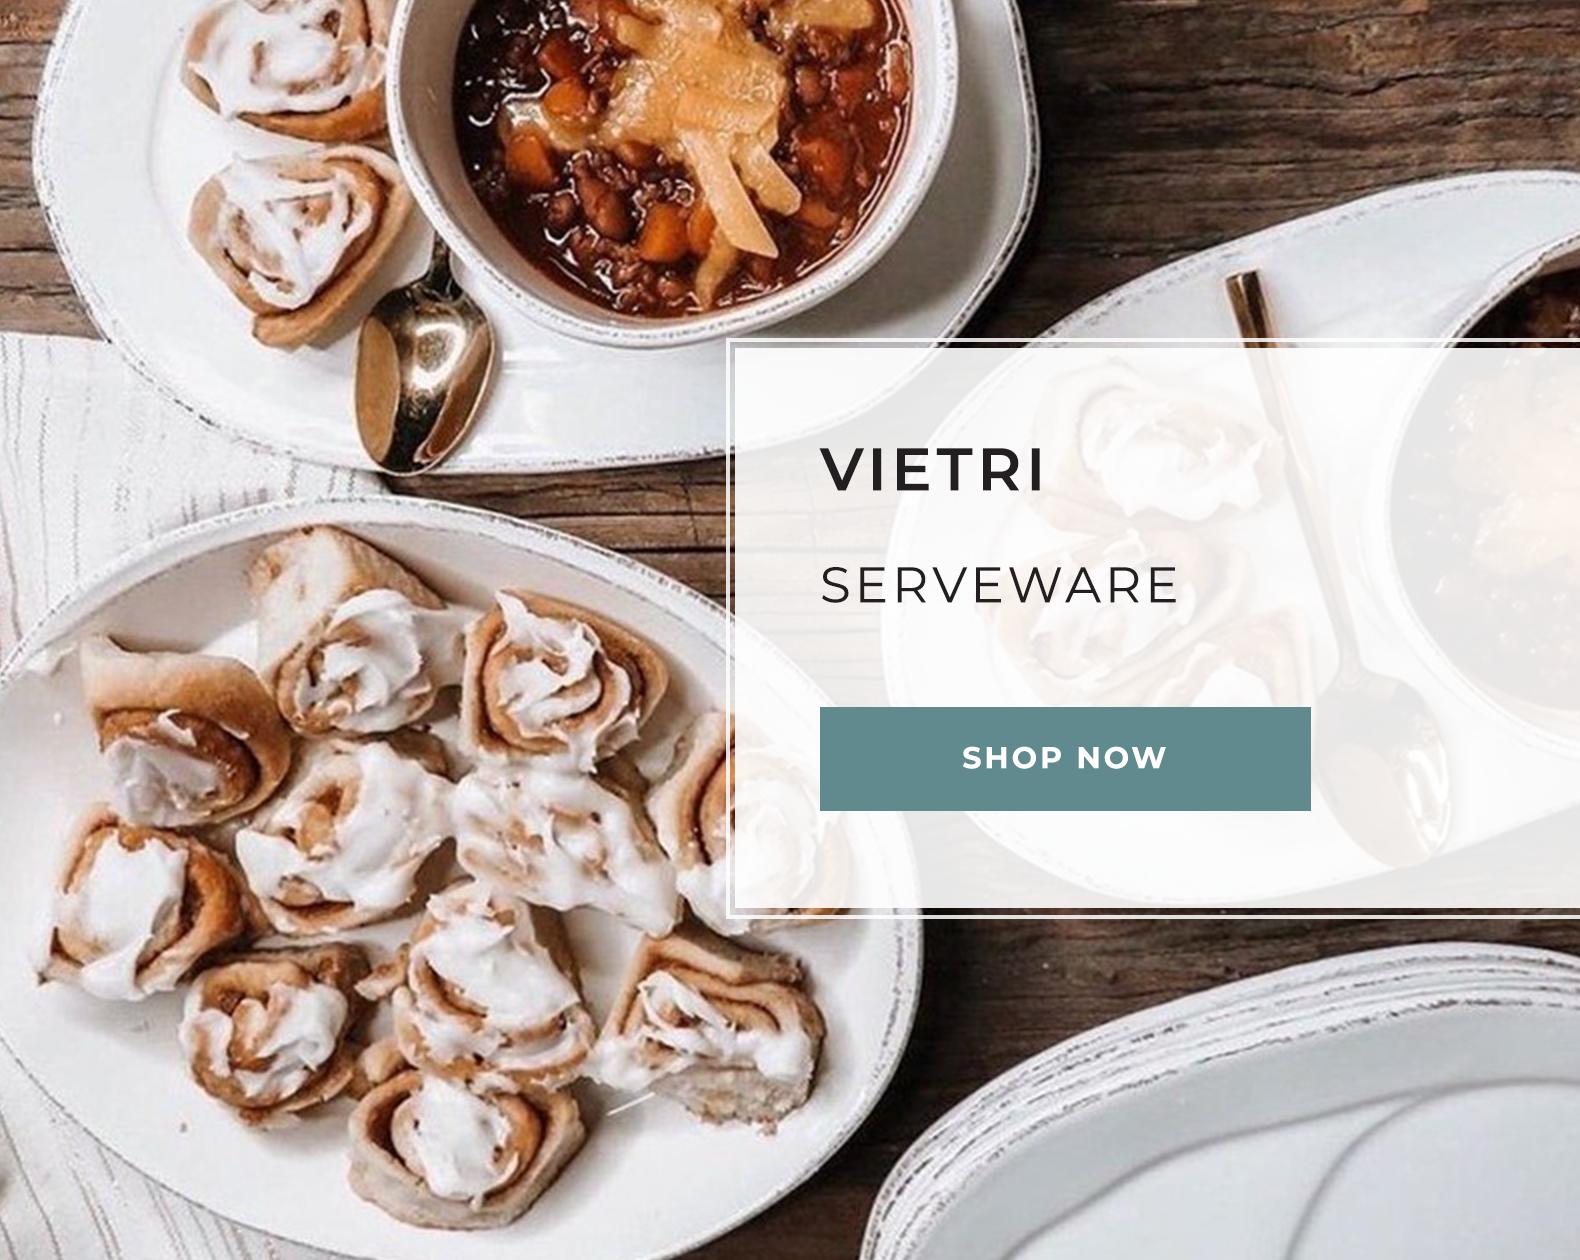 vietri - serveware